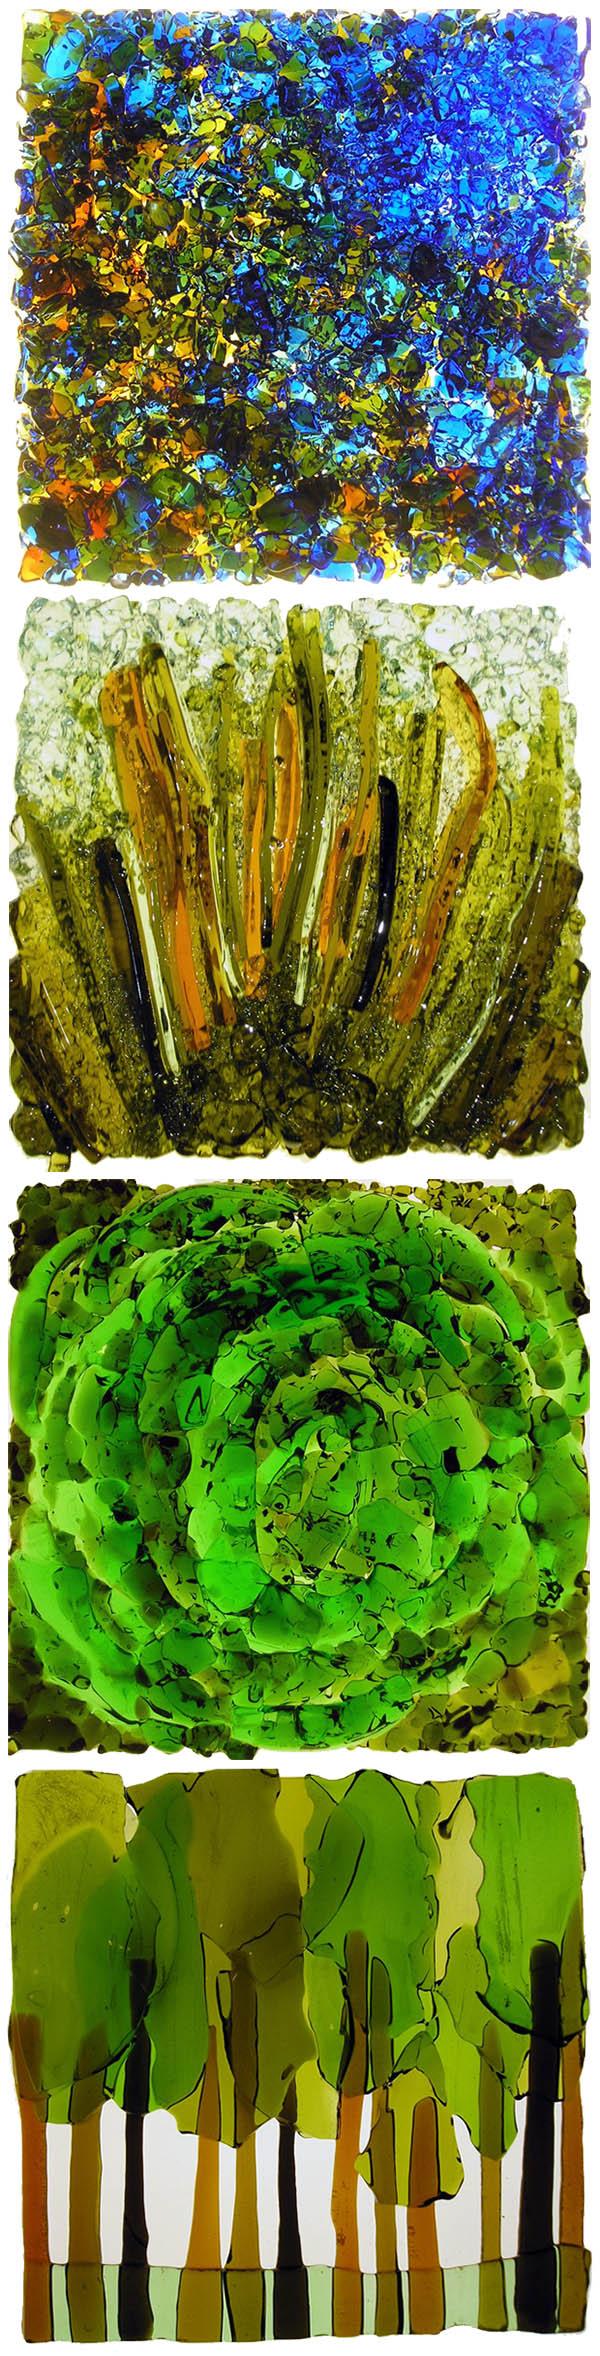 Terra Sophia - Art du verre recyclé - Vitraux de Nikki Root